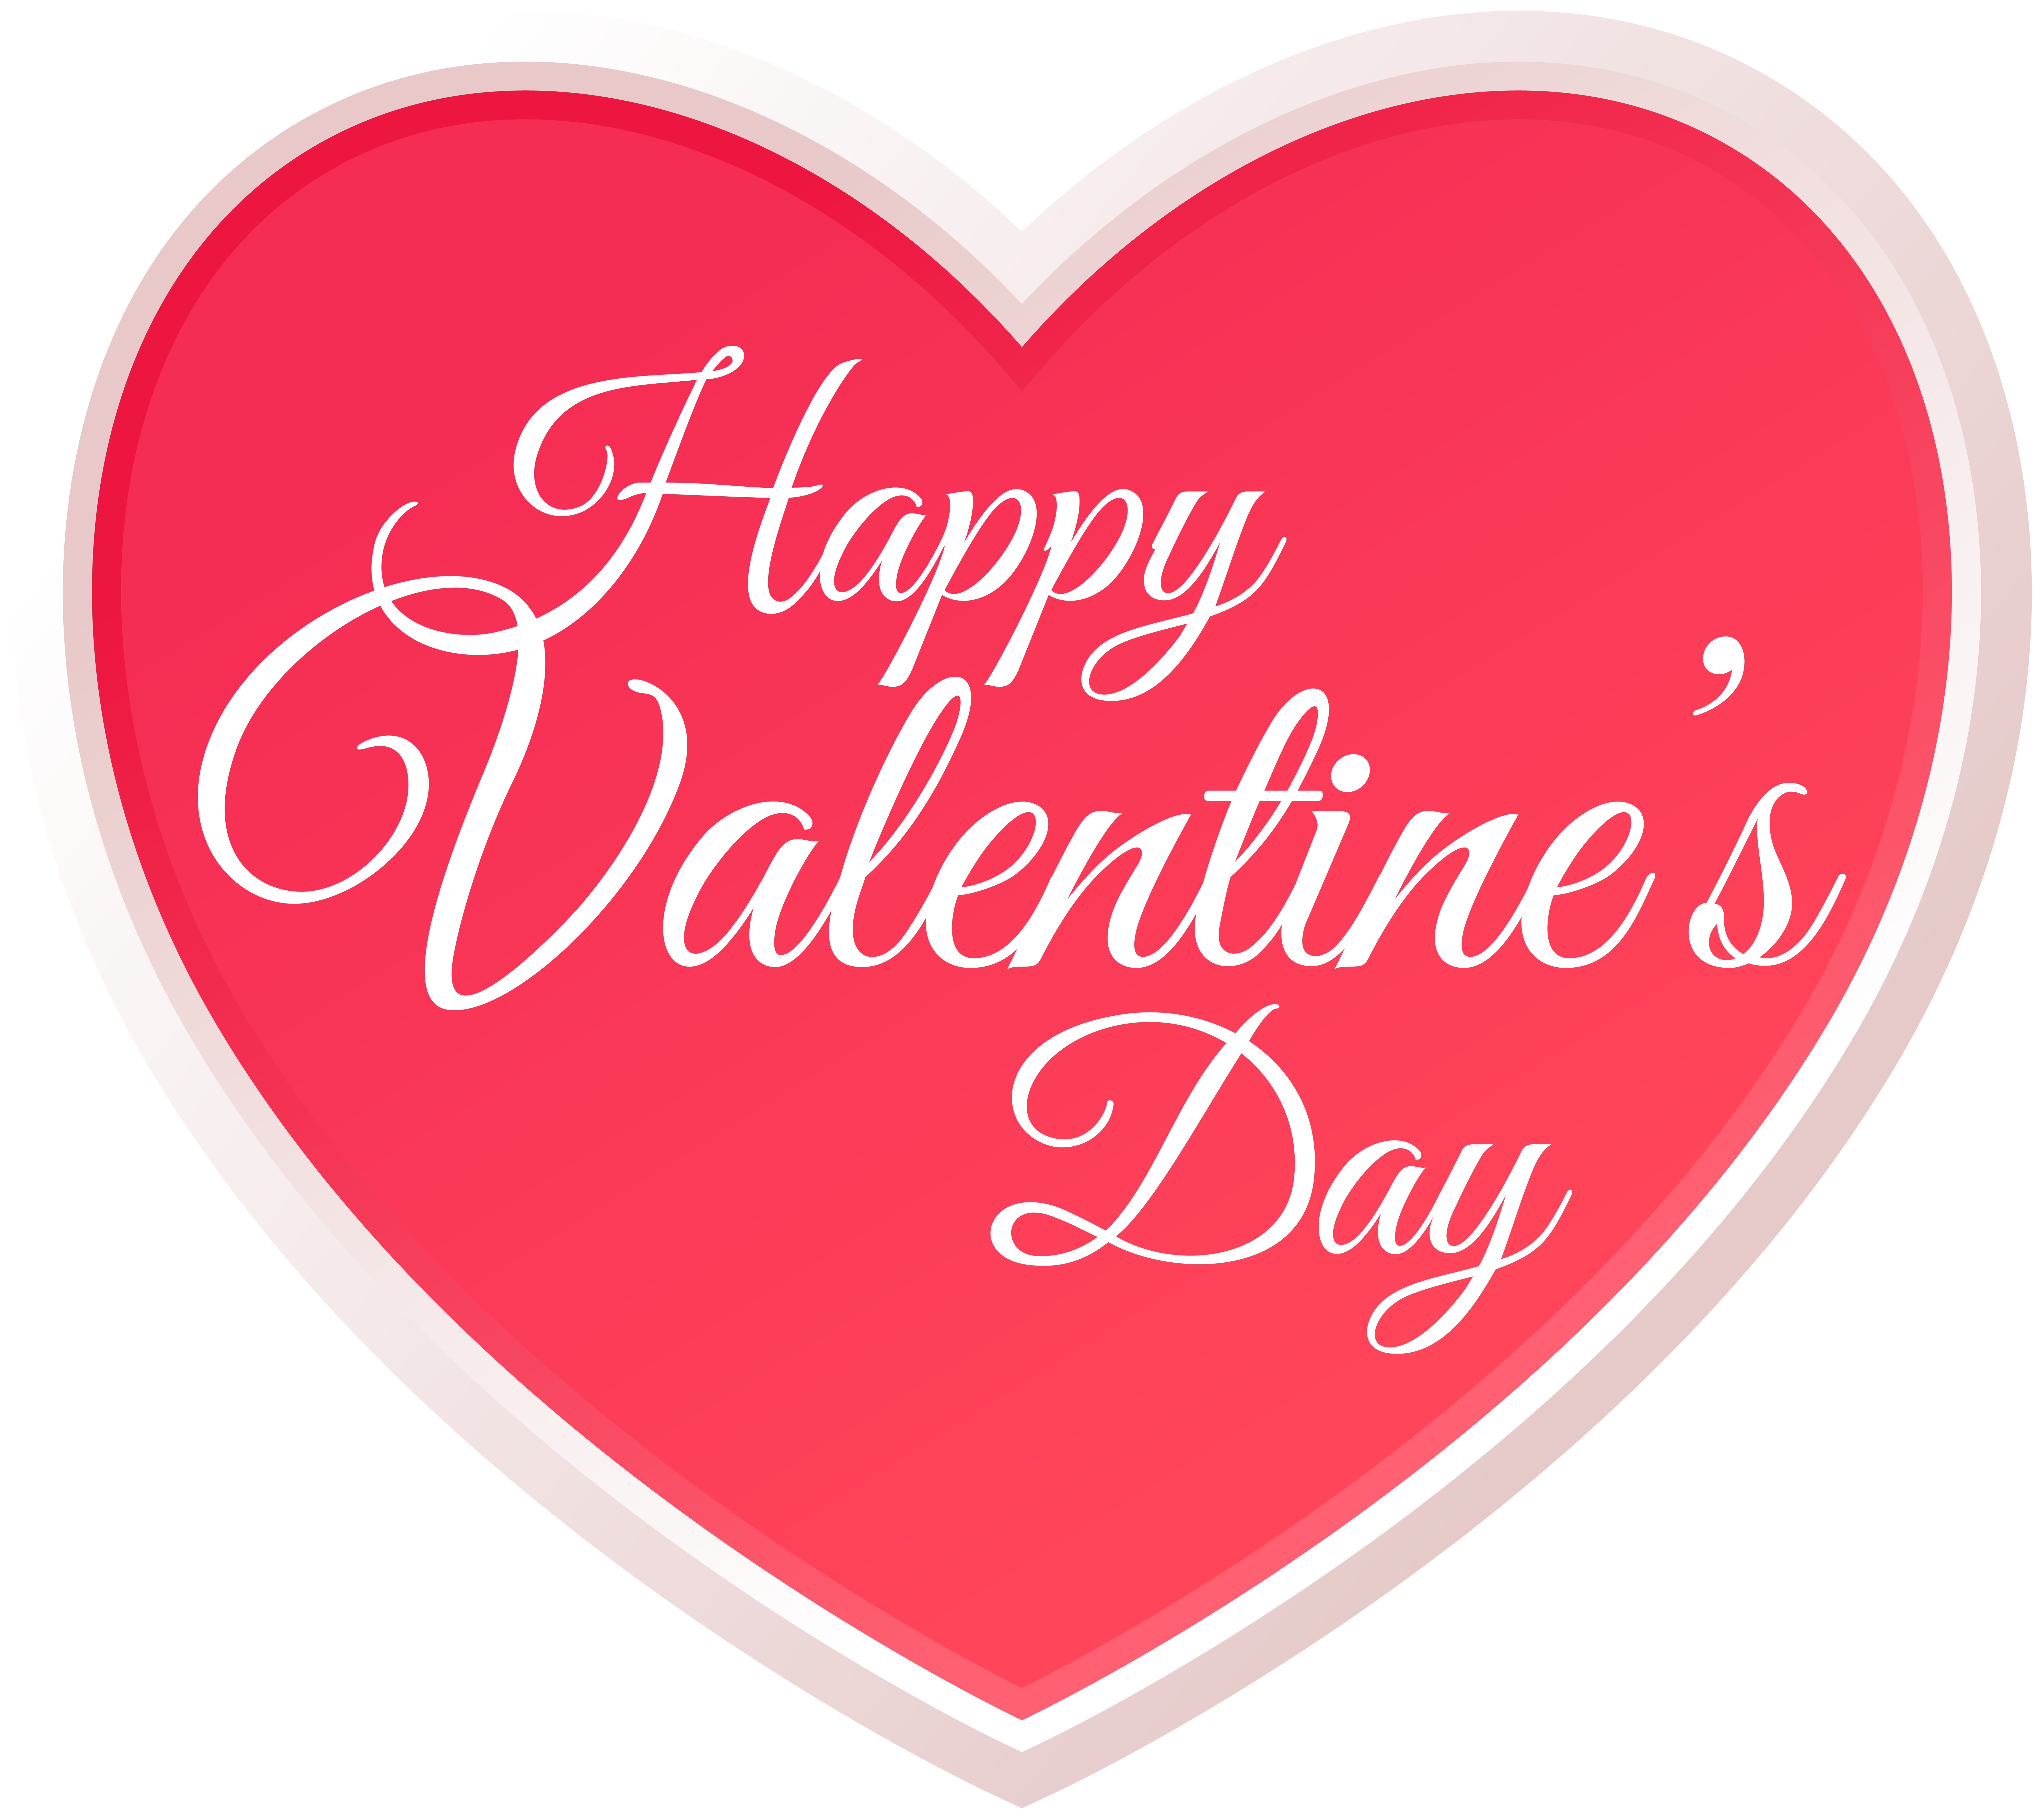 Clipart calendar valentines day, Clipart calendar ...